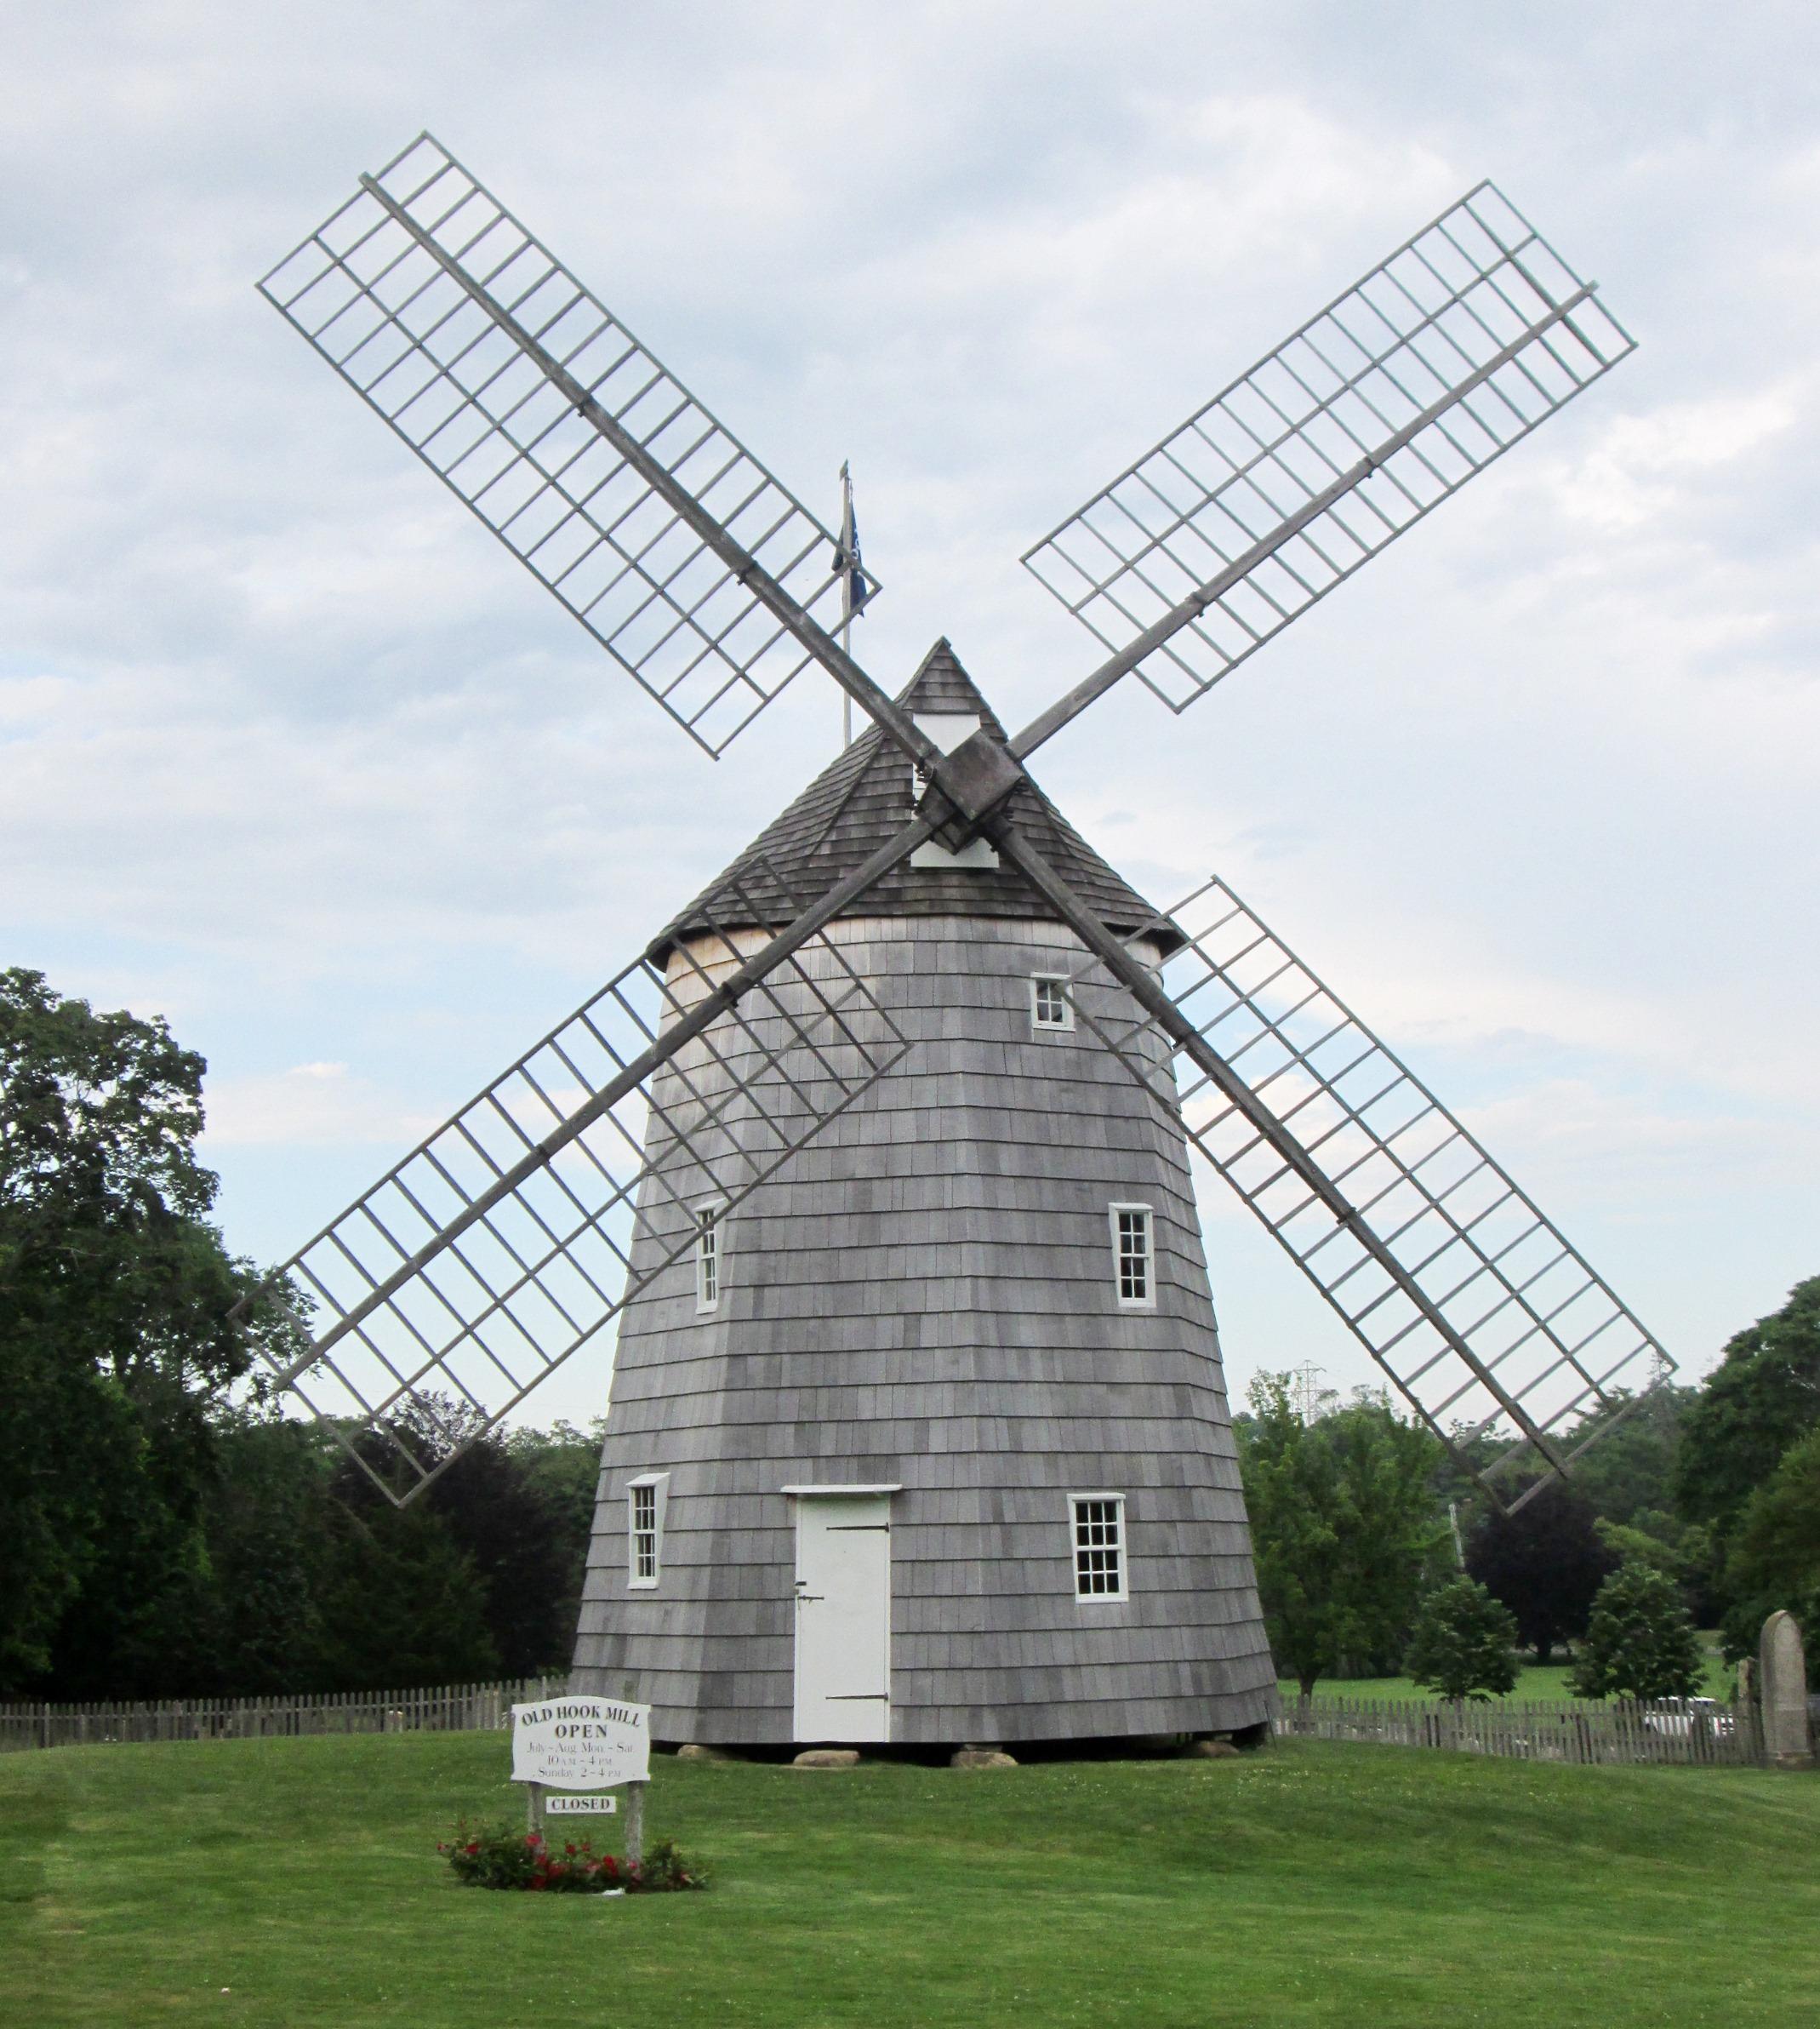 Old_Hook_Mill_East_Hampton.jpg